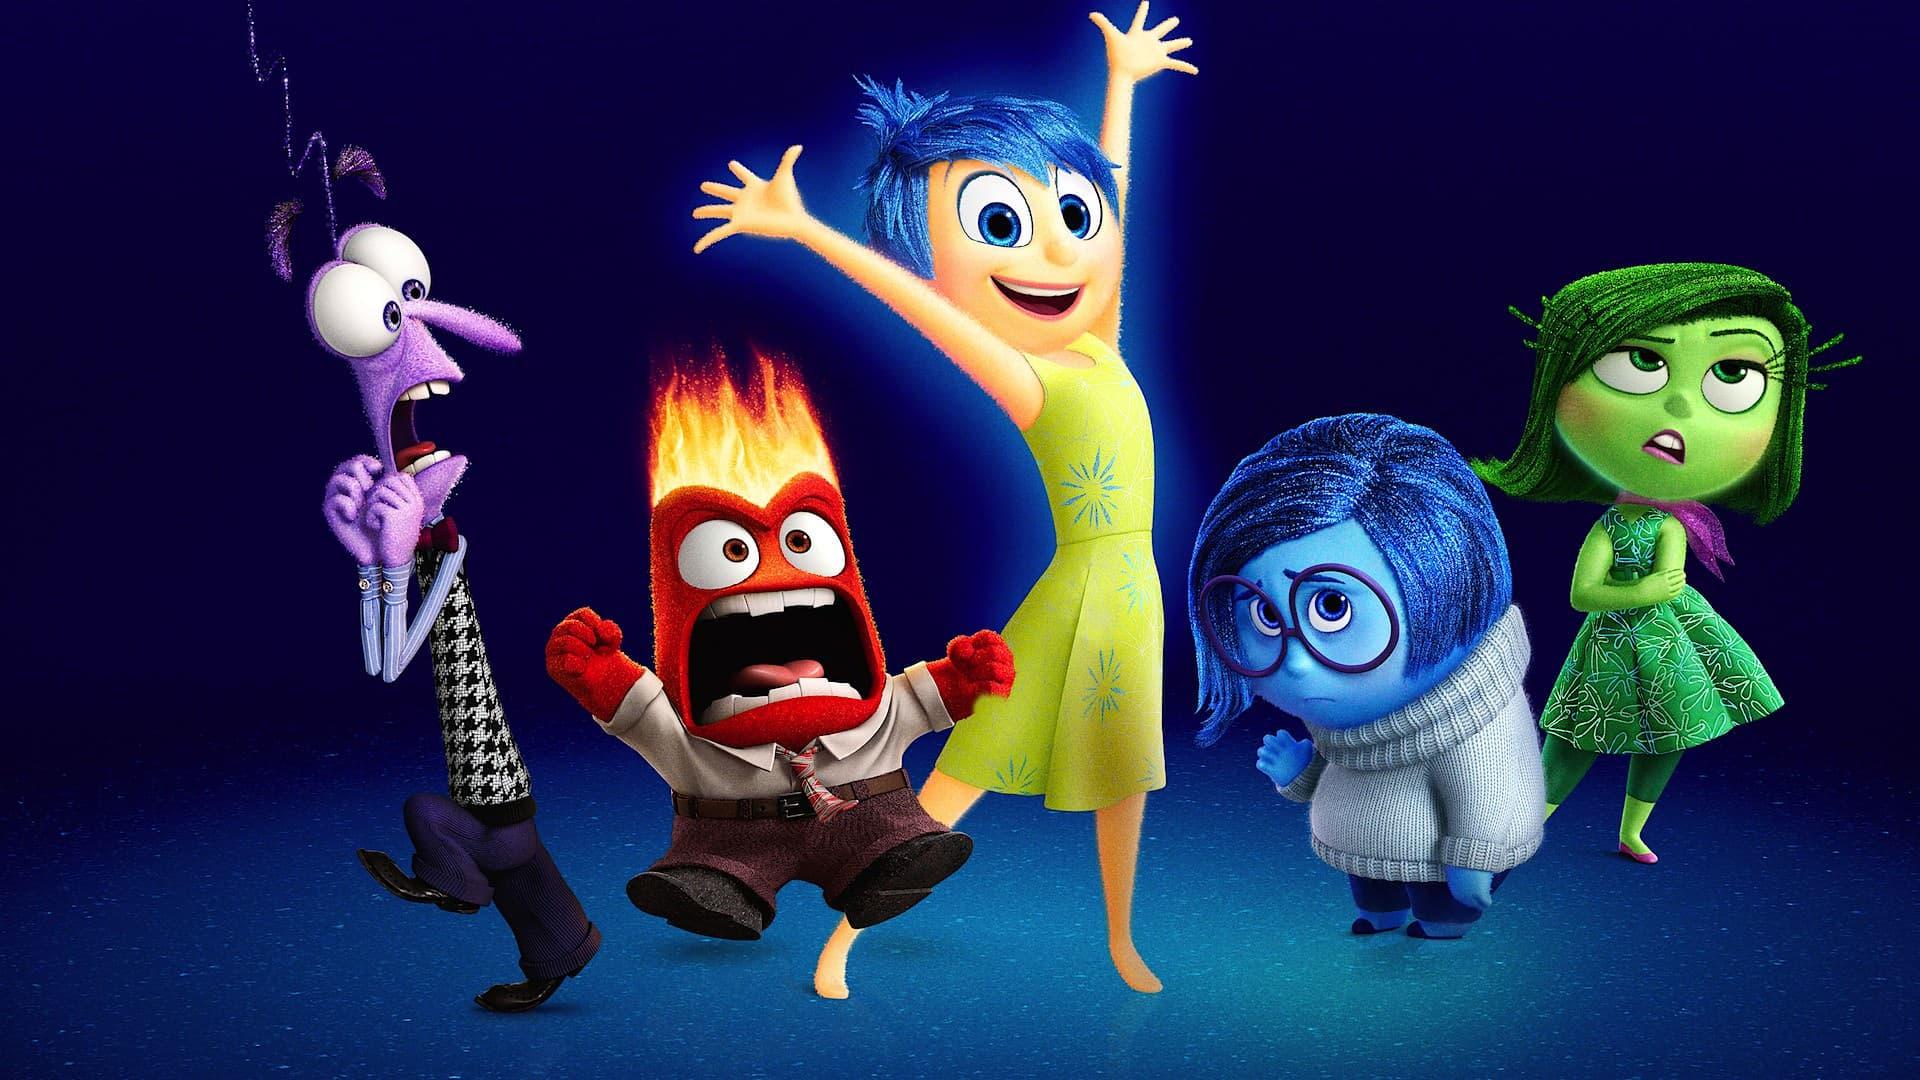 Disney Pixar Wallpapers Hd Wallpaper Cave